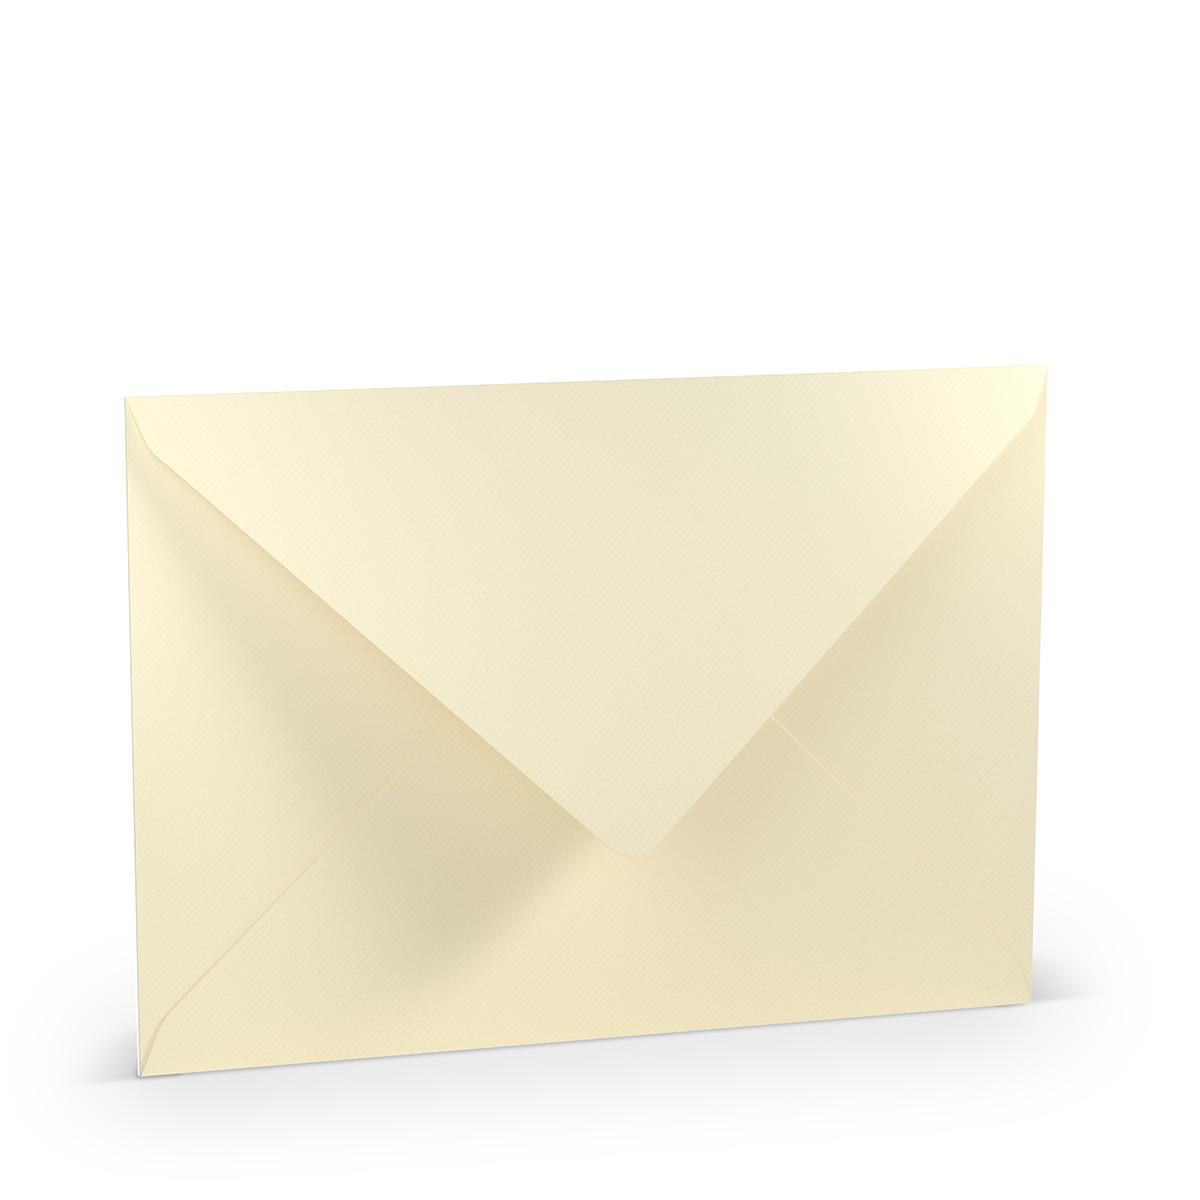 C4 Briefumschlag Format Papedelcacom